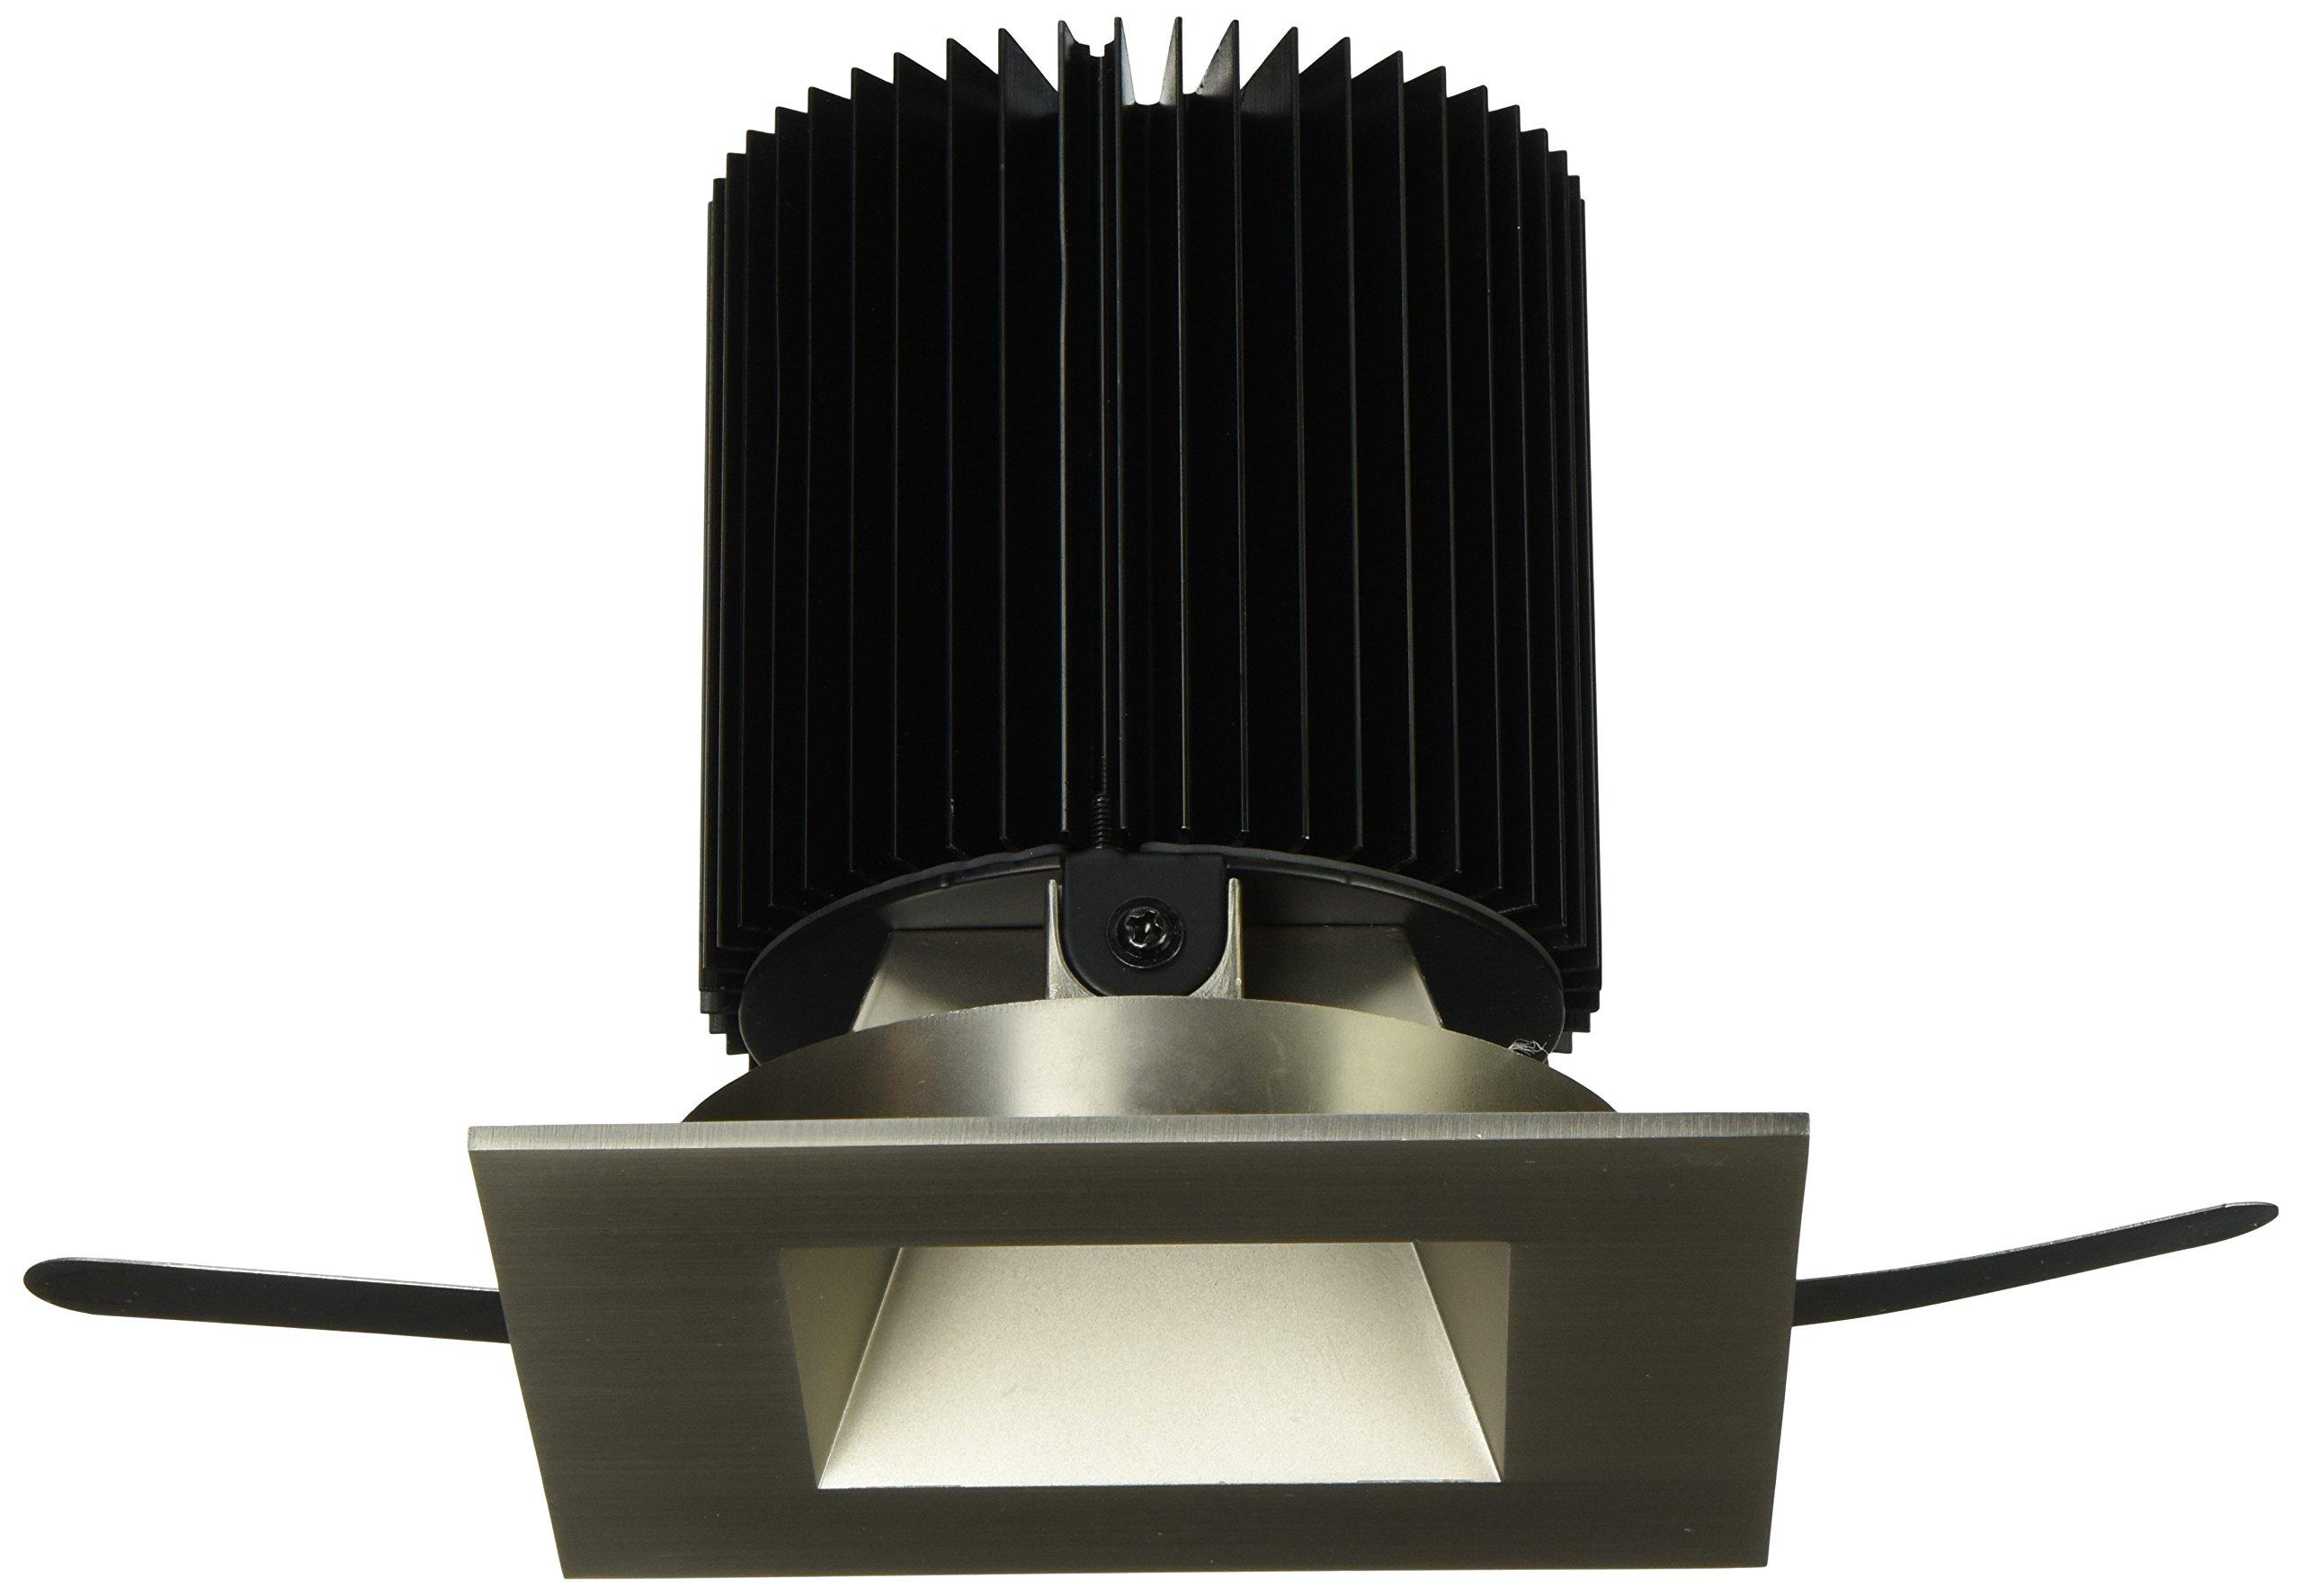 WAC Lighting HR-3LED-T718F-27BN Tesla - LED 3-Inch Open Square Trim 50-Degree Angle, 2700K